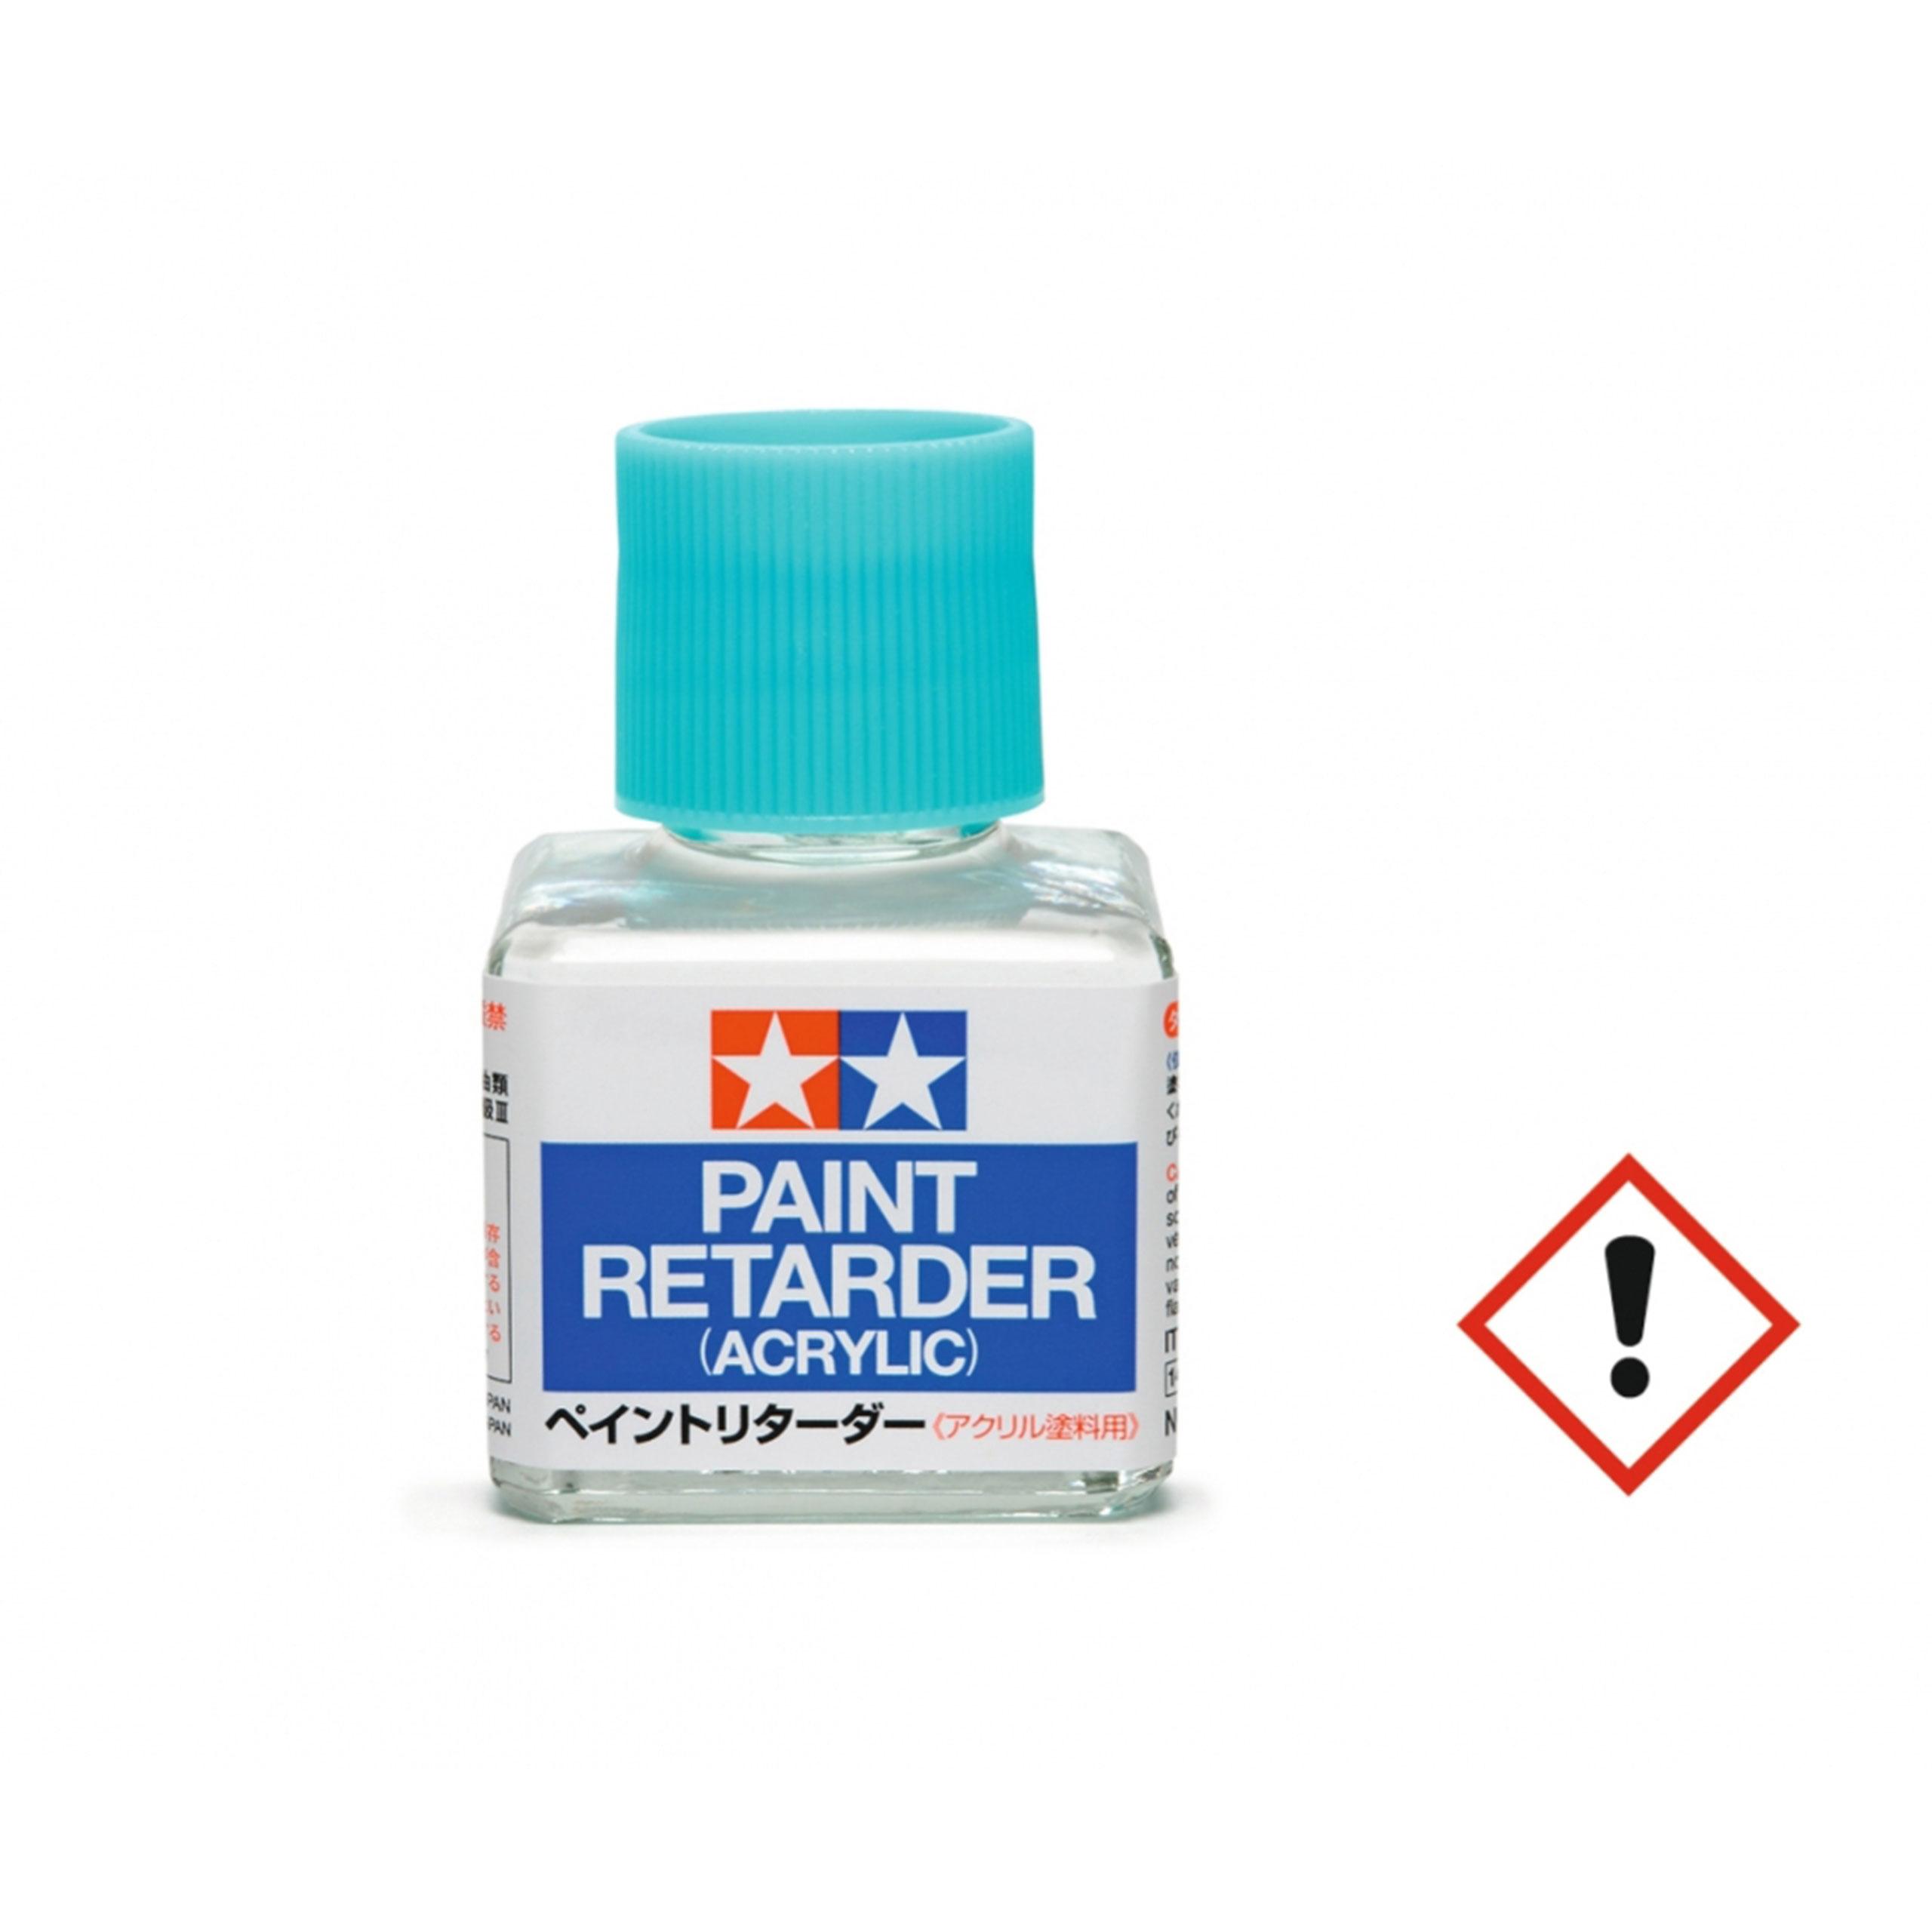 Acryl Farb Verzoegerer - 40ml Paint Retarder Tamiya 300087114